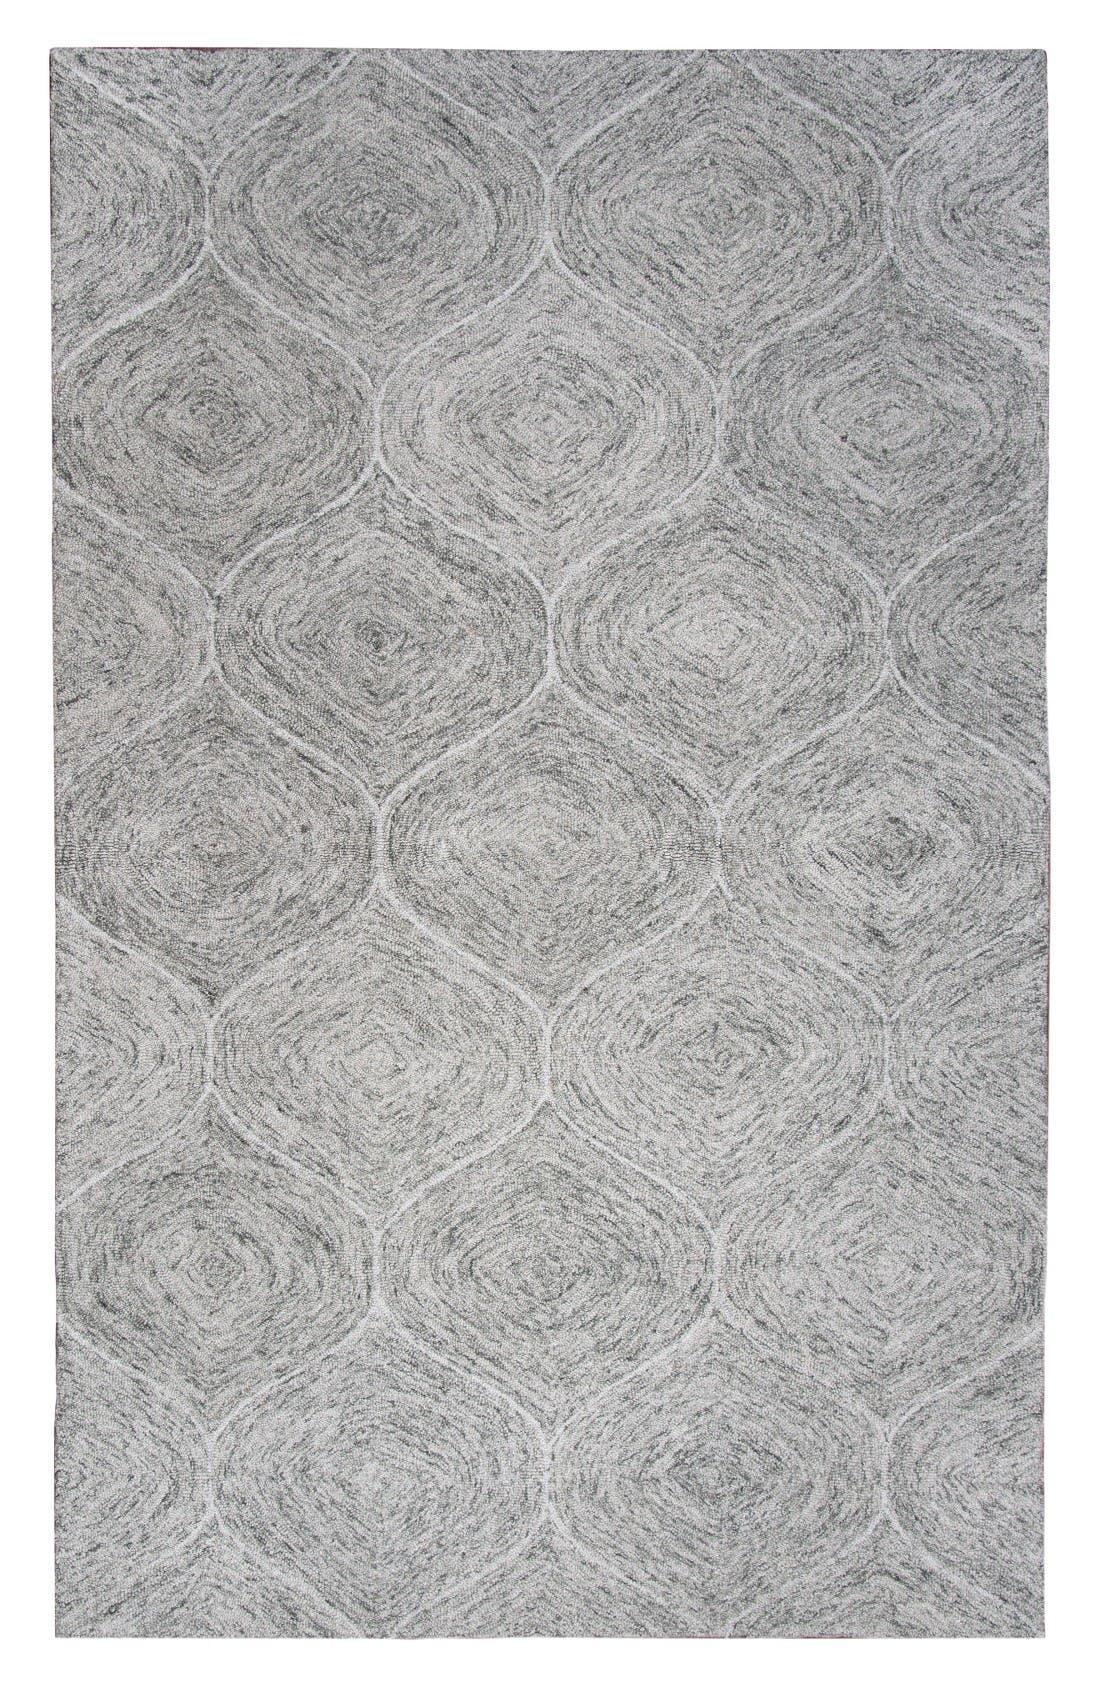 Irregular Diamond Hand Tufted Wool Area Rug,                             Main thumbnail 1, color,                             Grey